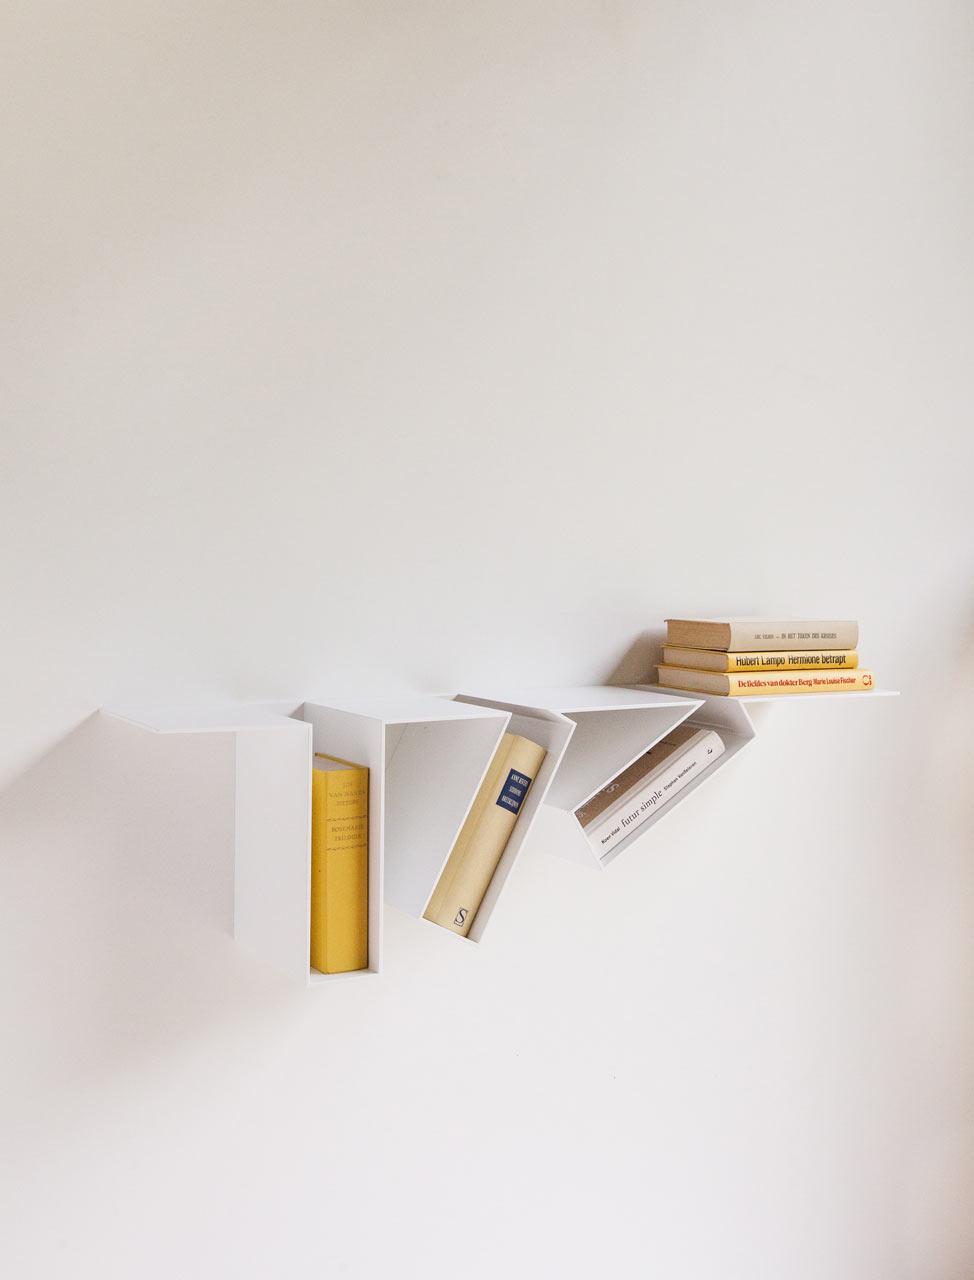 Filip-Janssens-Oblique-bookshelves-hisheji (7)